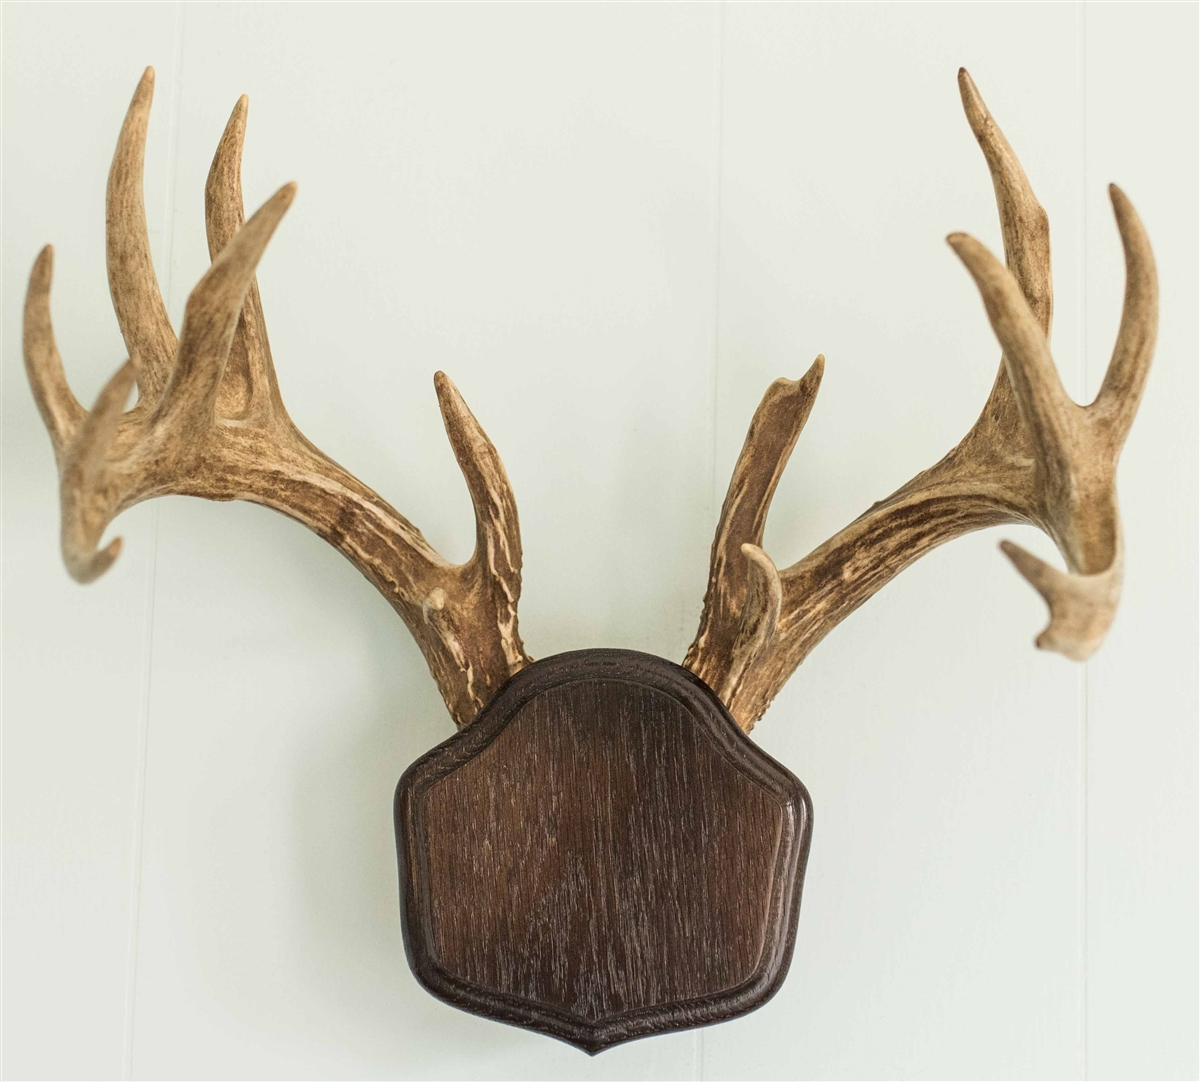 Deer antler mounting kit instructions - Deer Antler Mounting Kit Instructions 13